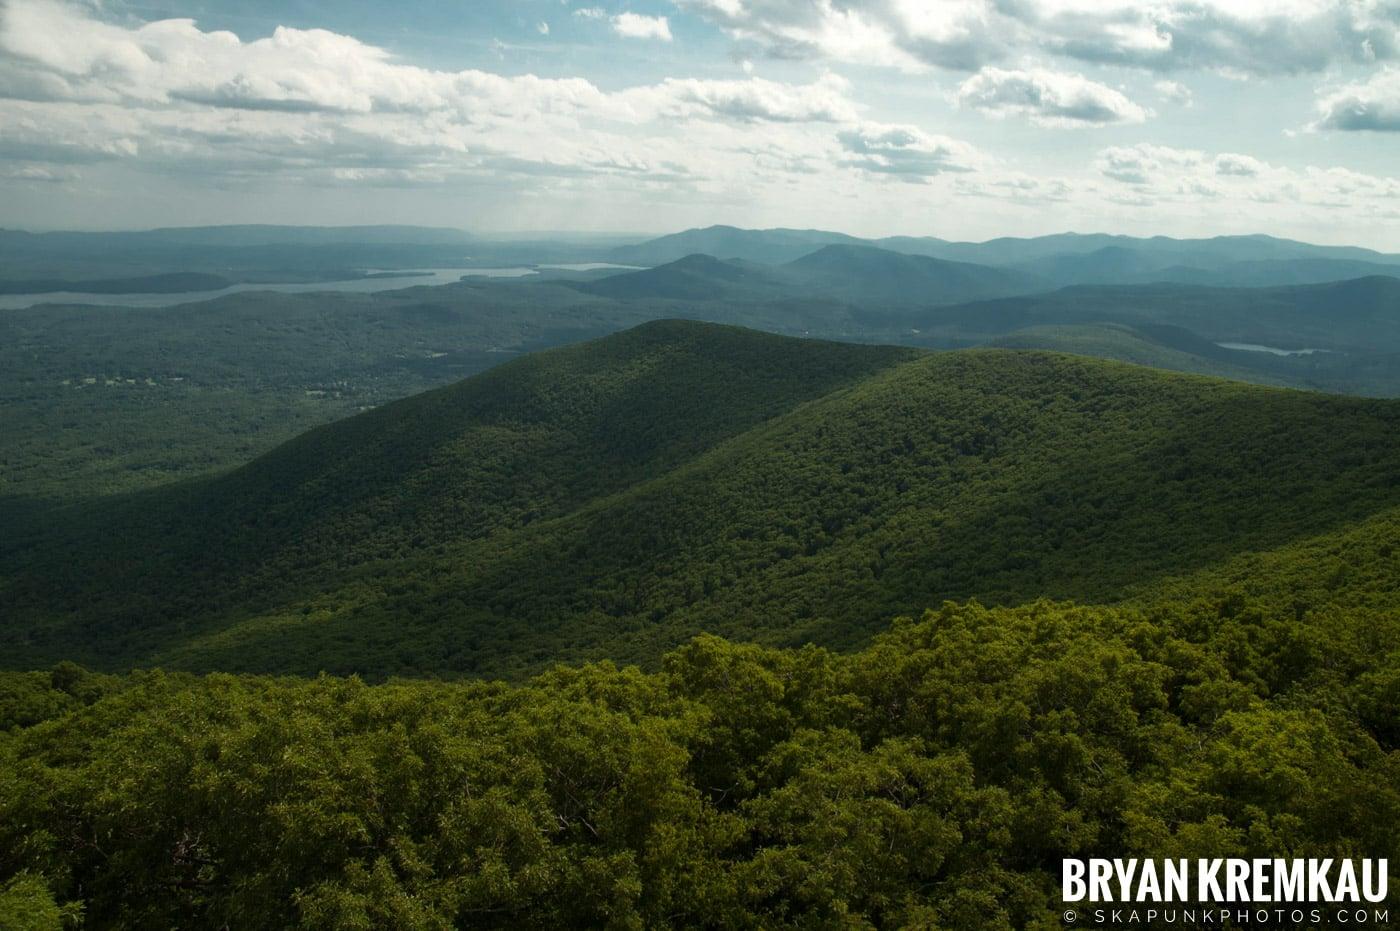 Catskills Overlook Mountain @ Woodstock, NY - 6.24.07 (1)